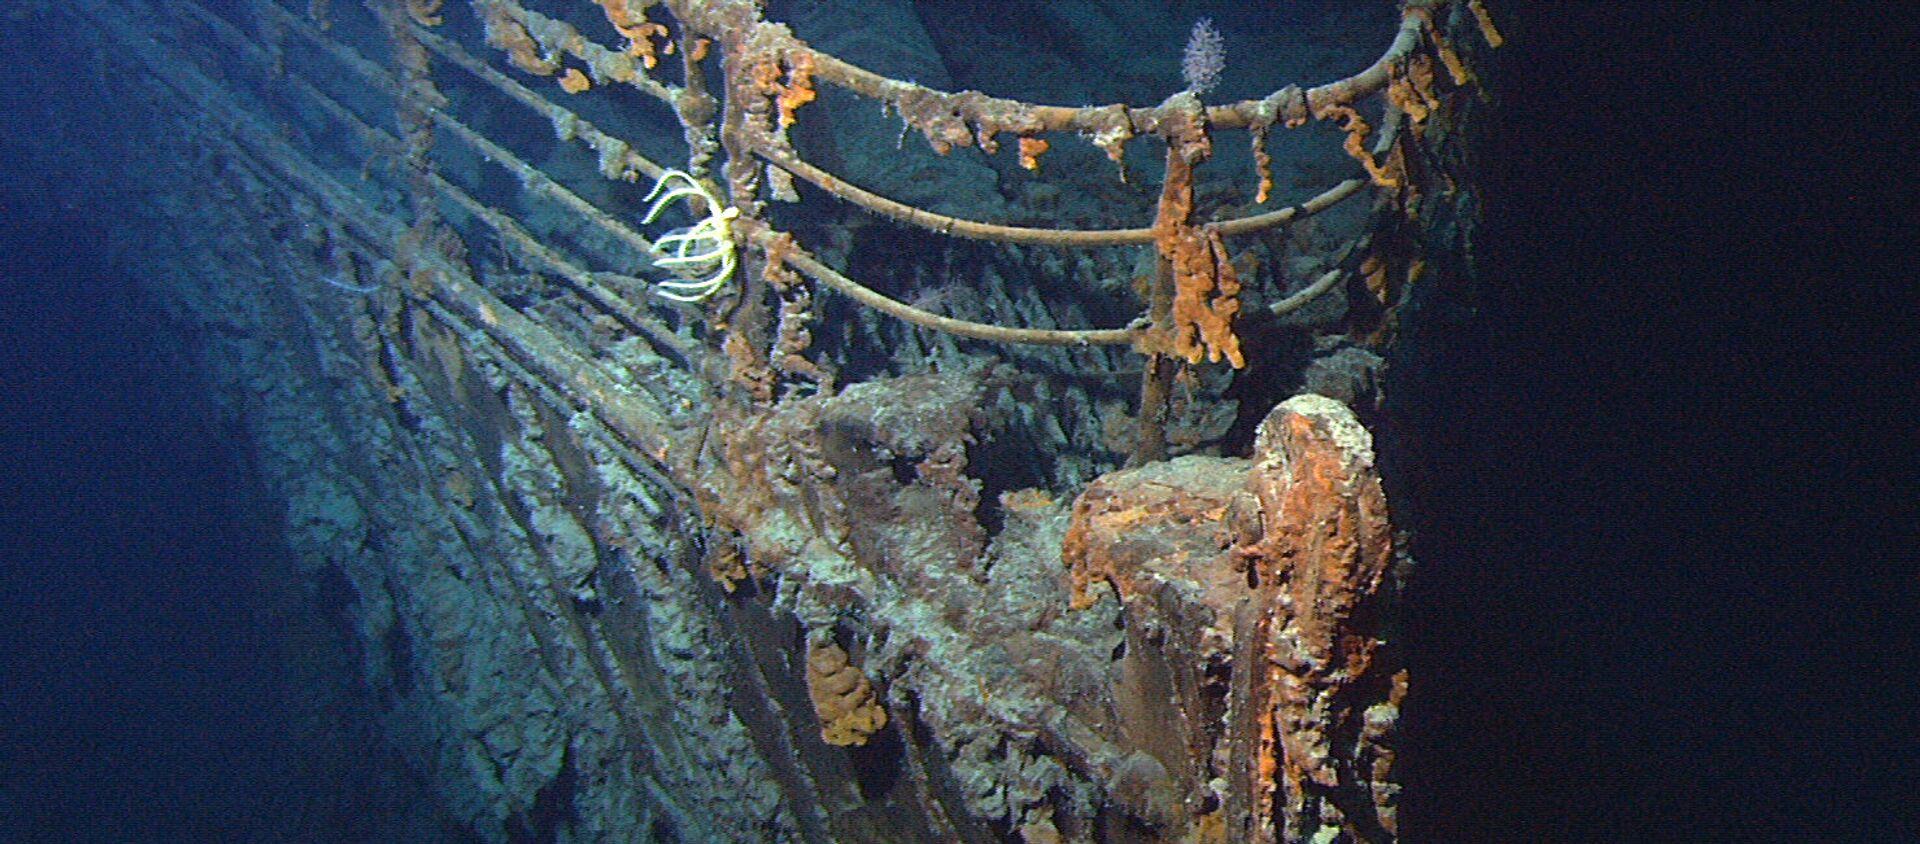 Restos del Titanic - Sputnik Mundo, 1920, 05.11.2020